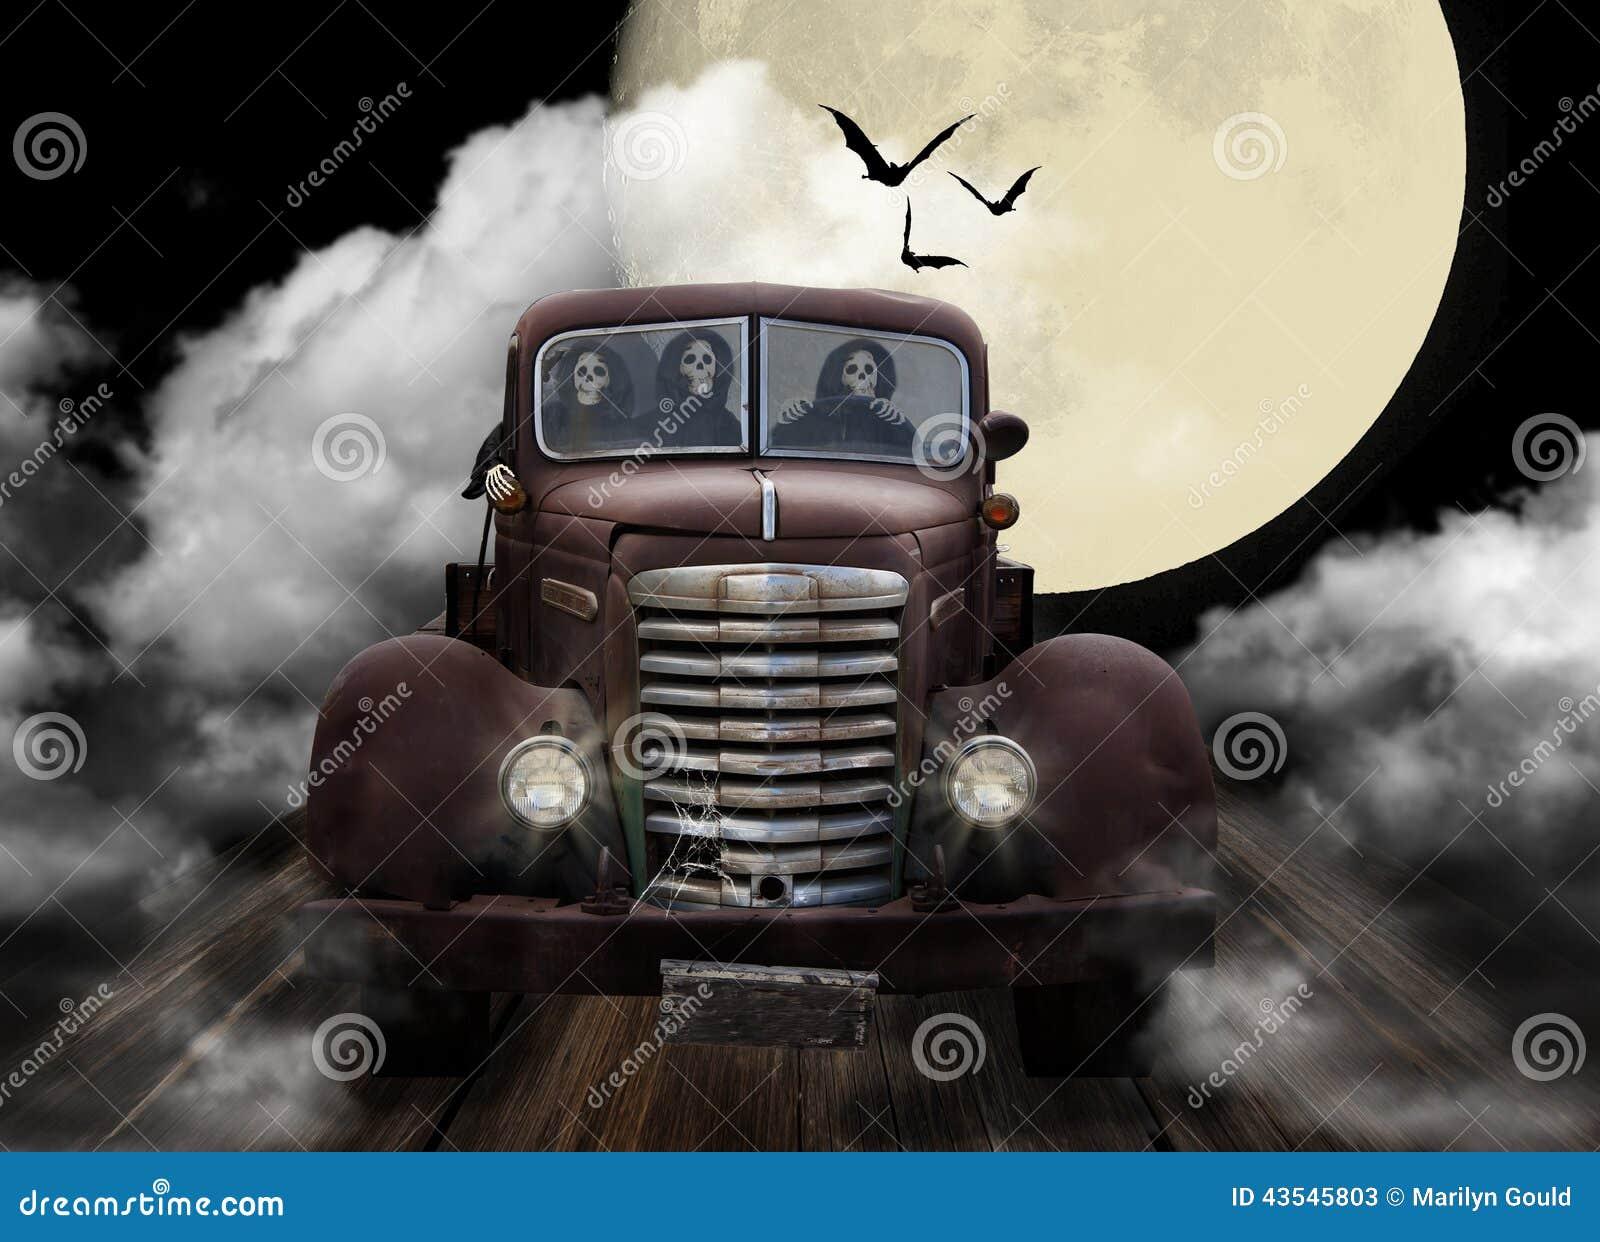 Halloween Ghouls Joyriding in Truck